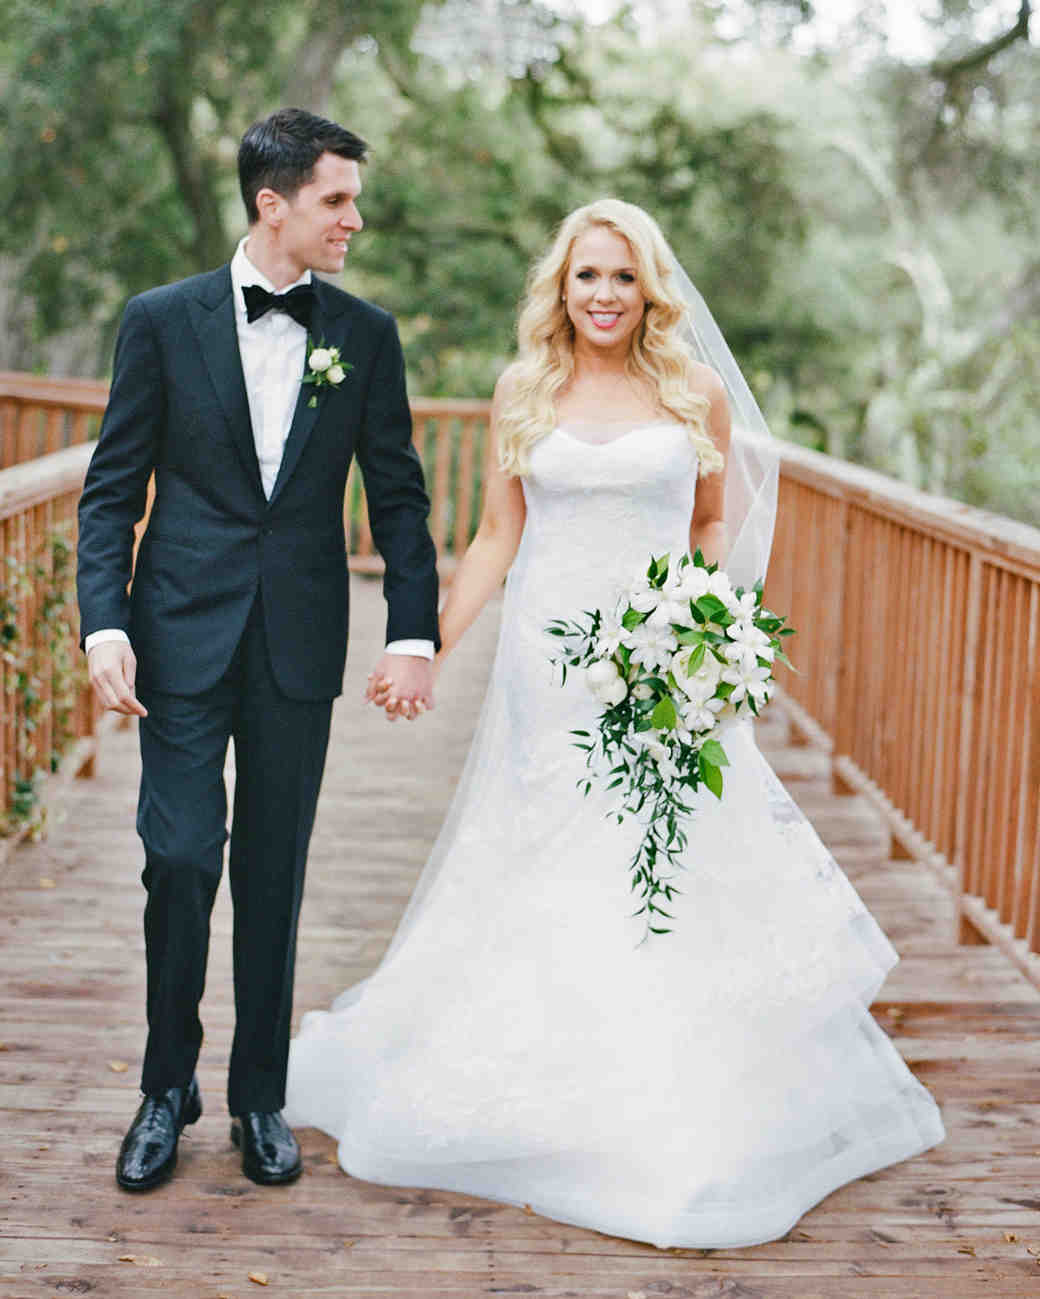 Shannon reabe wedding